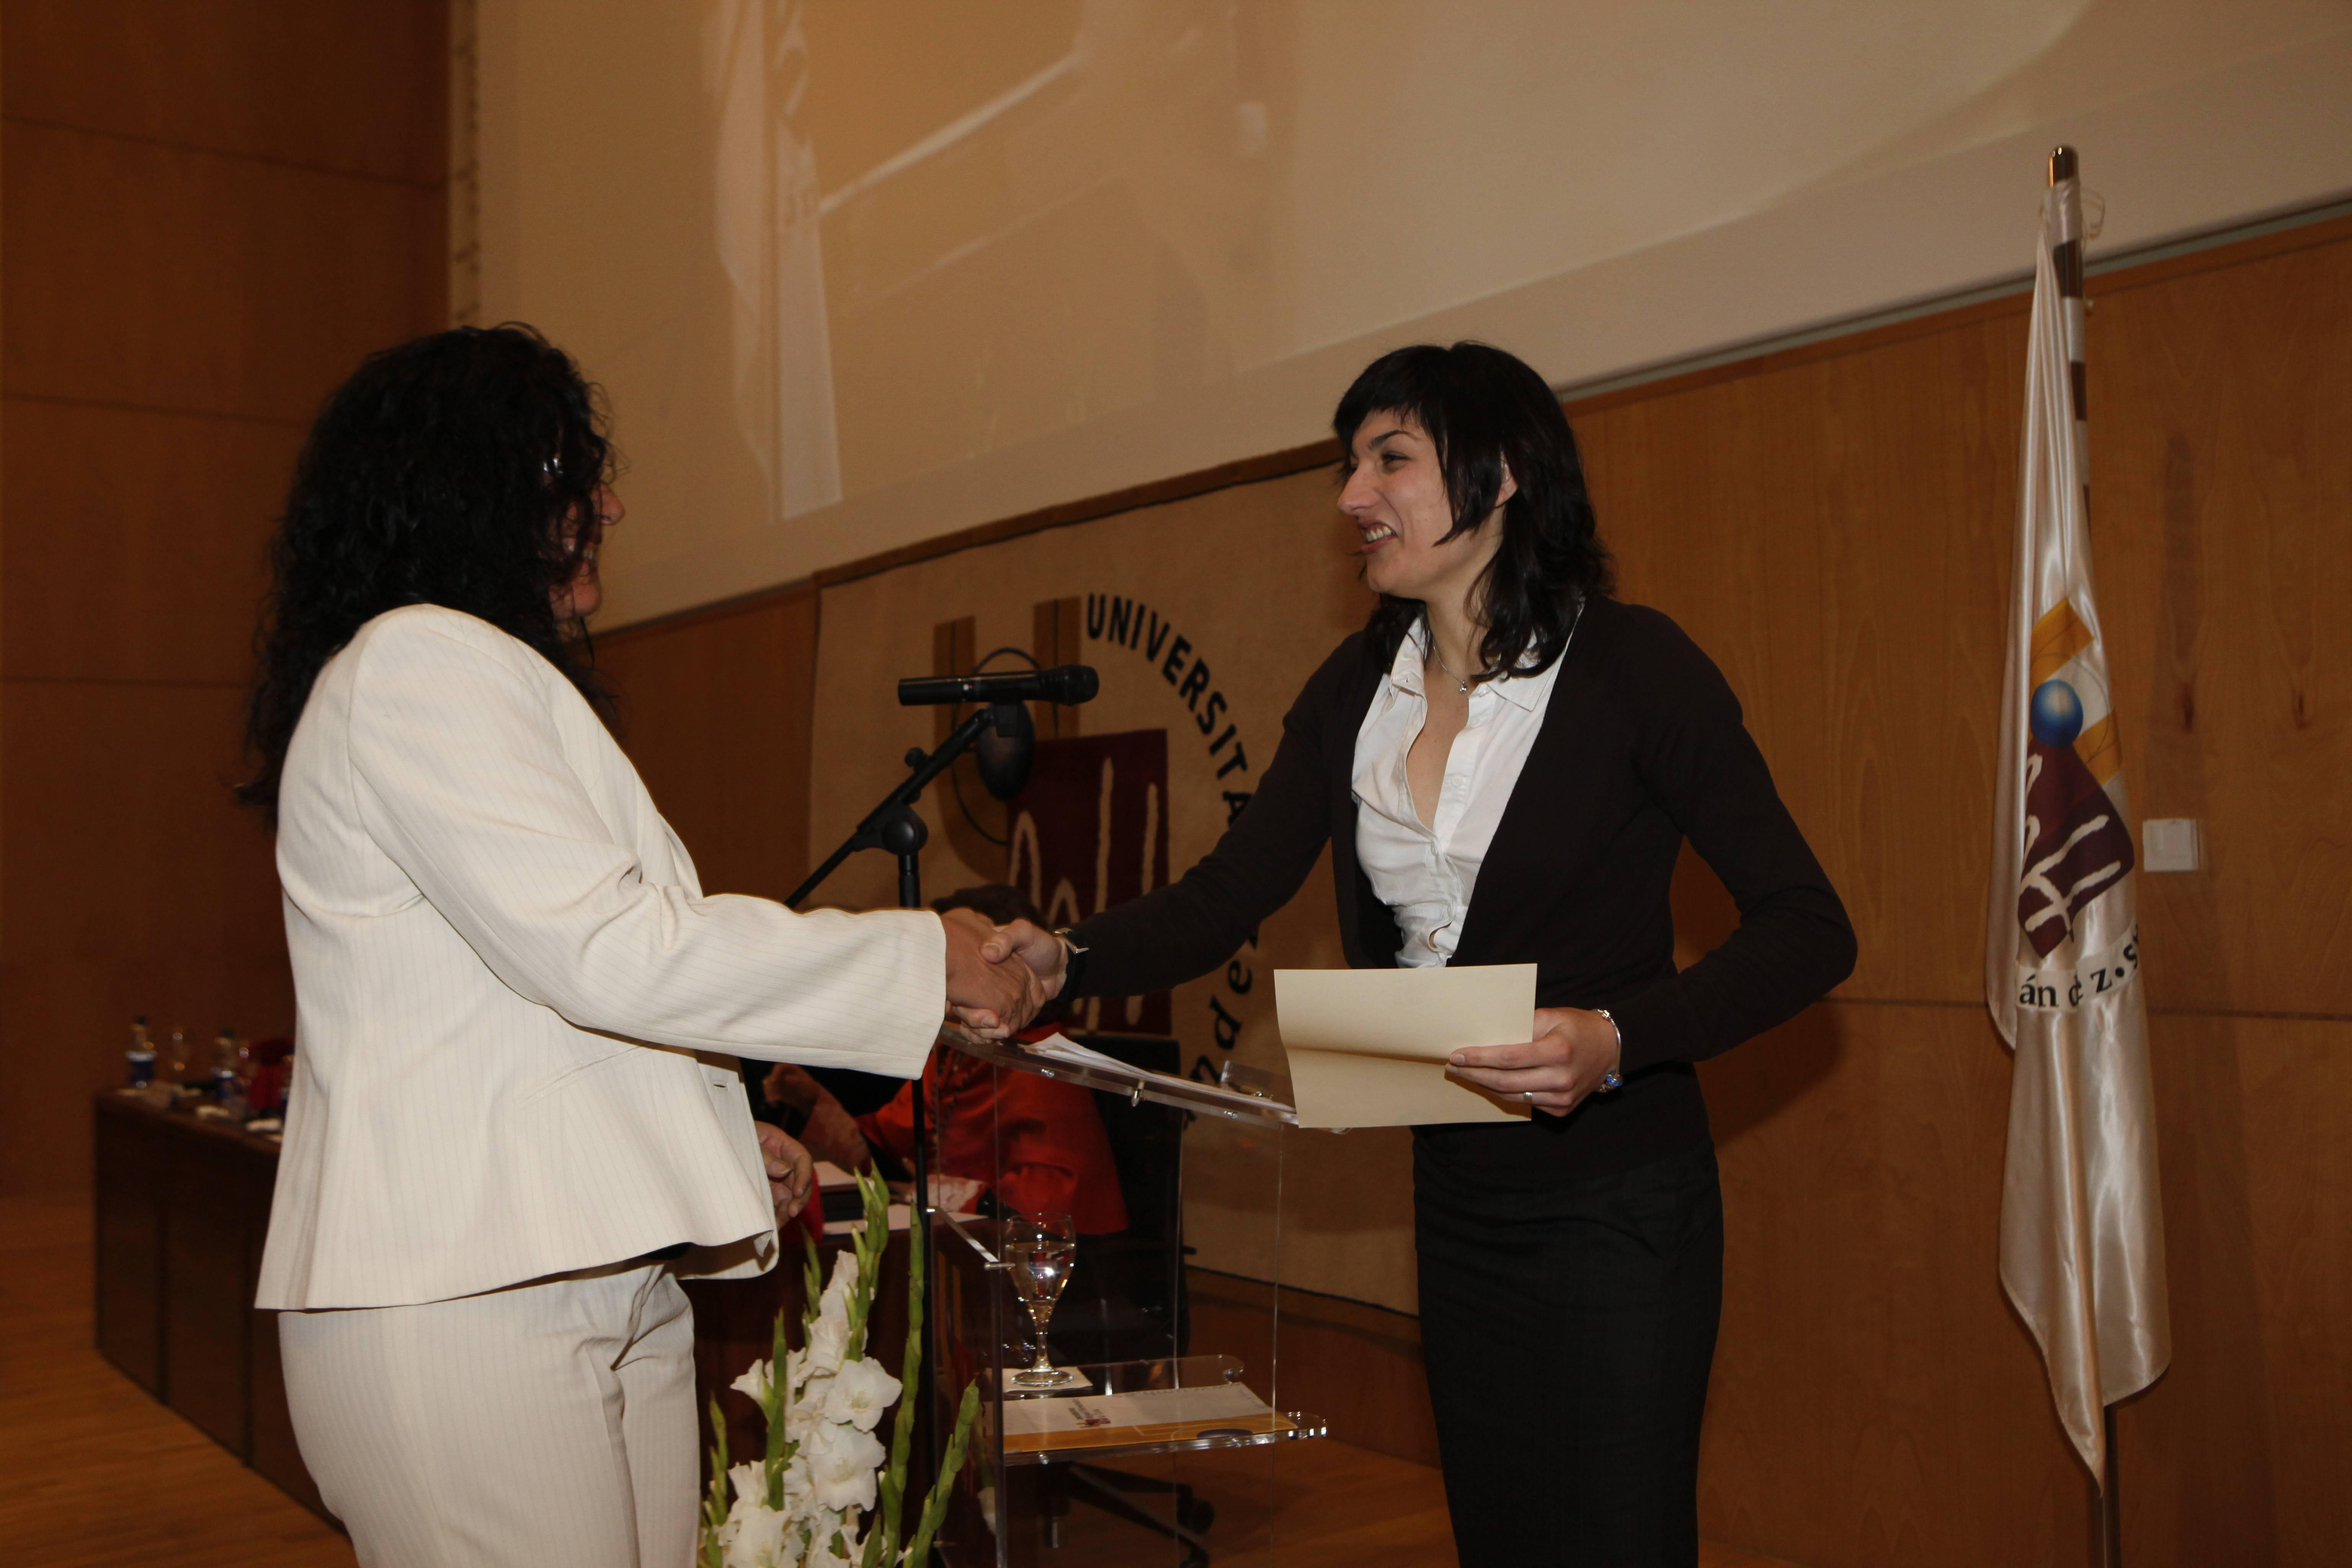 doctor-honoris-causa-luis-gamir_mg_1010.jpg